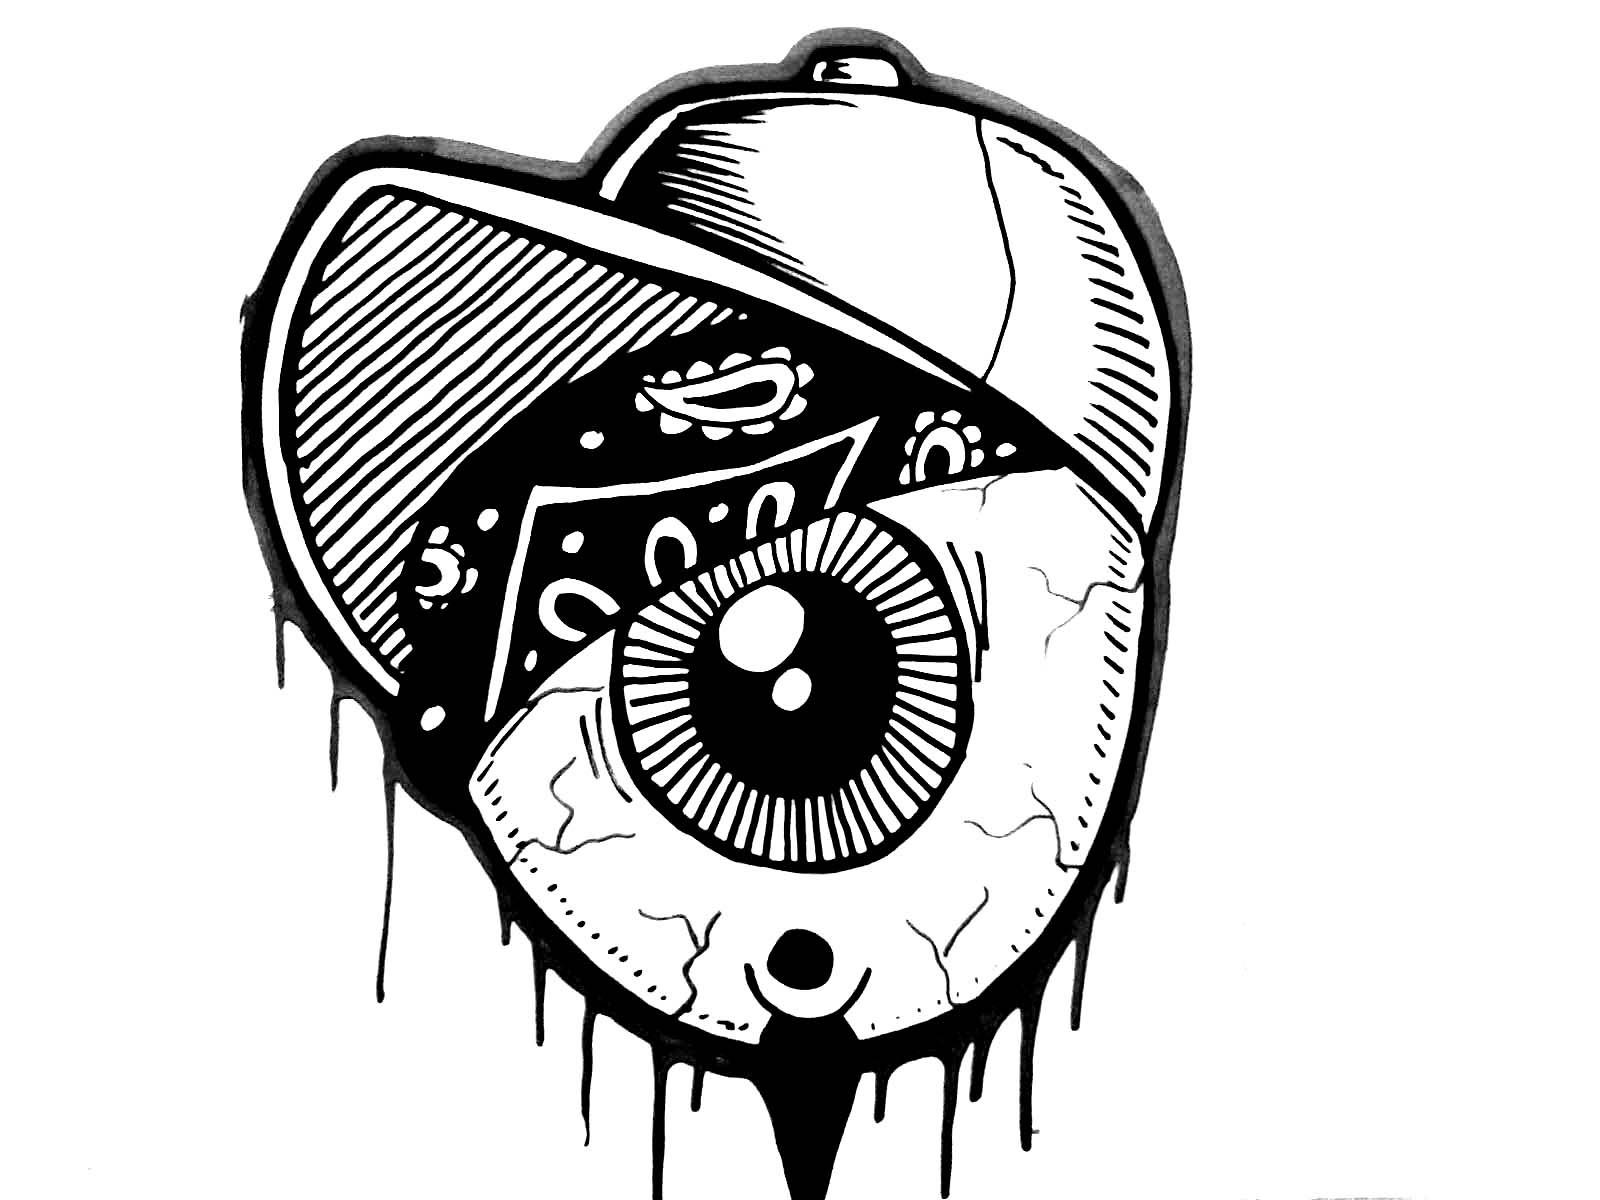 1600x1200 Graffiti Characters Eyeball Graffiti Spray Can With An Eyeball